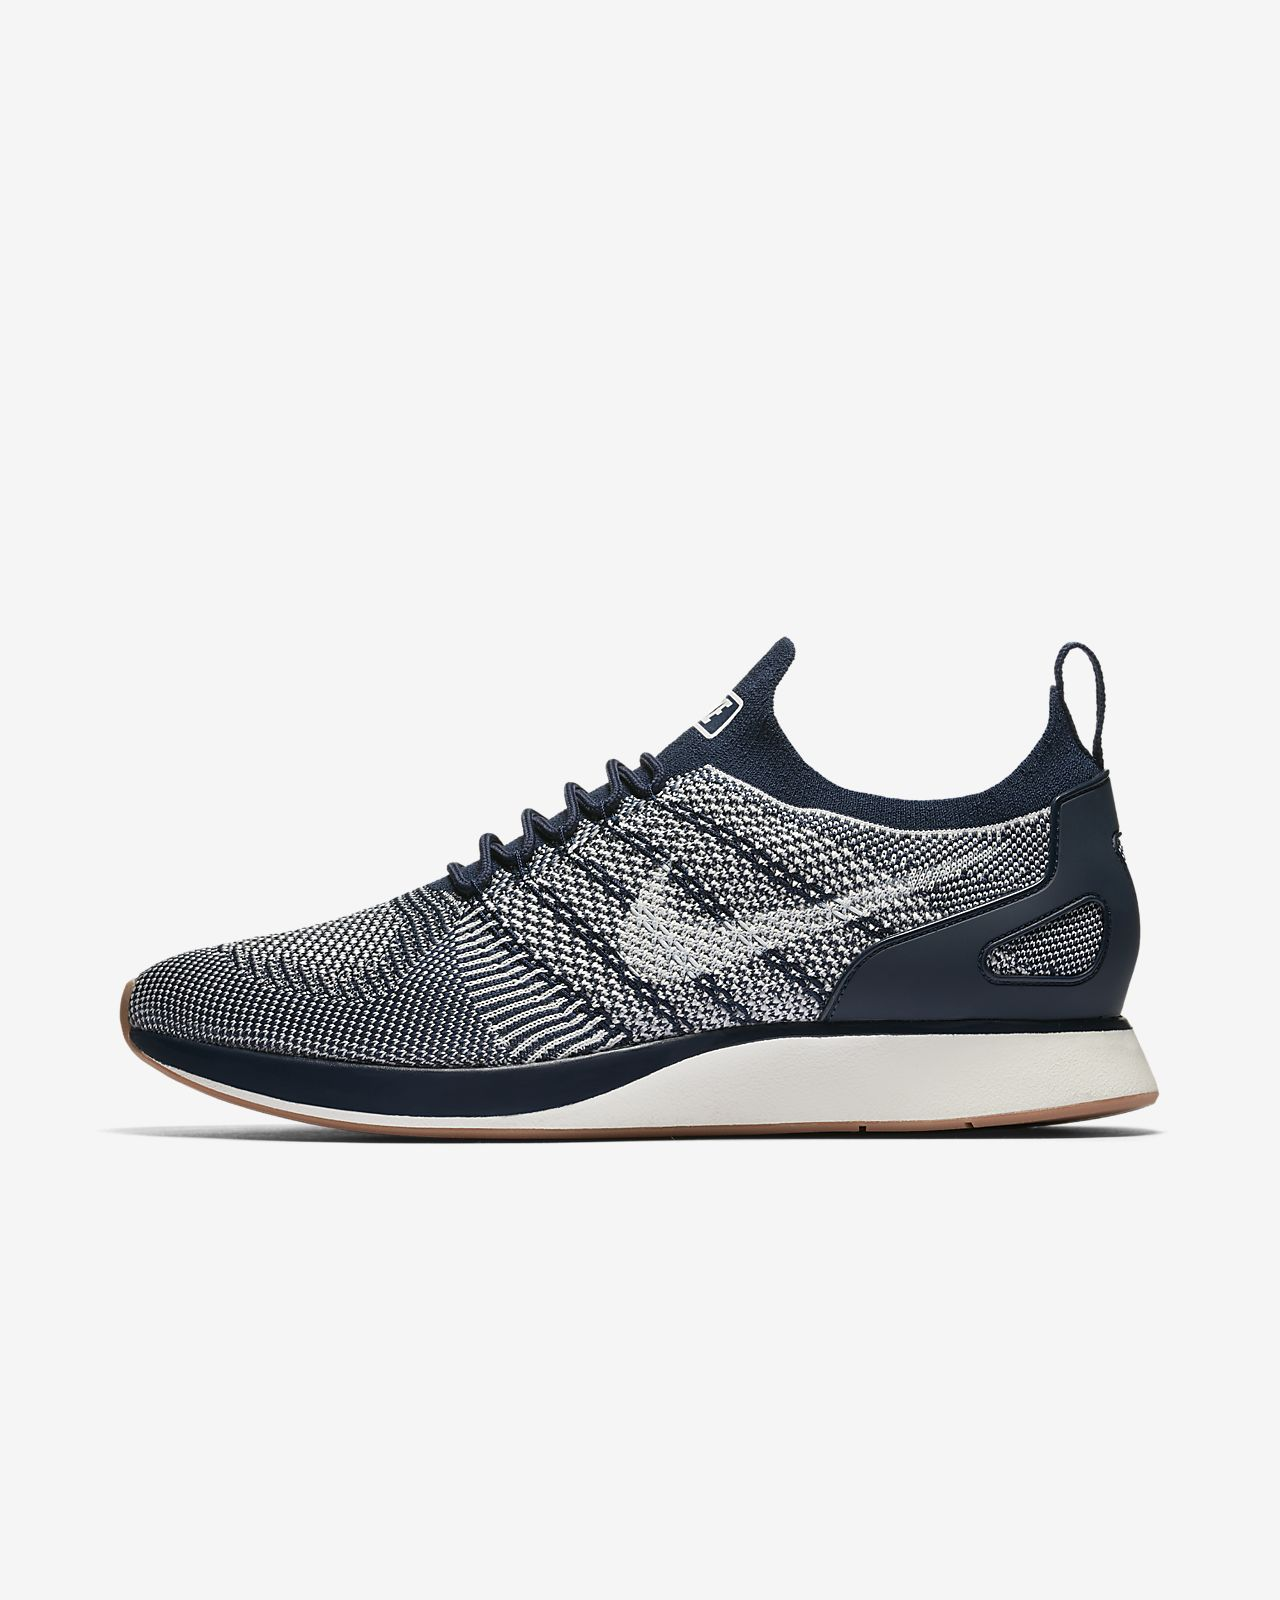 reputable site 6a5b2 daae1 Nike Sneaker Uomo Air Zoom MARIAH Flyknit Racer Scarpe da ginnastica  sportive